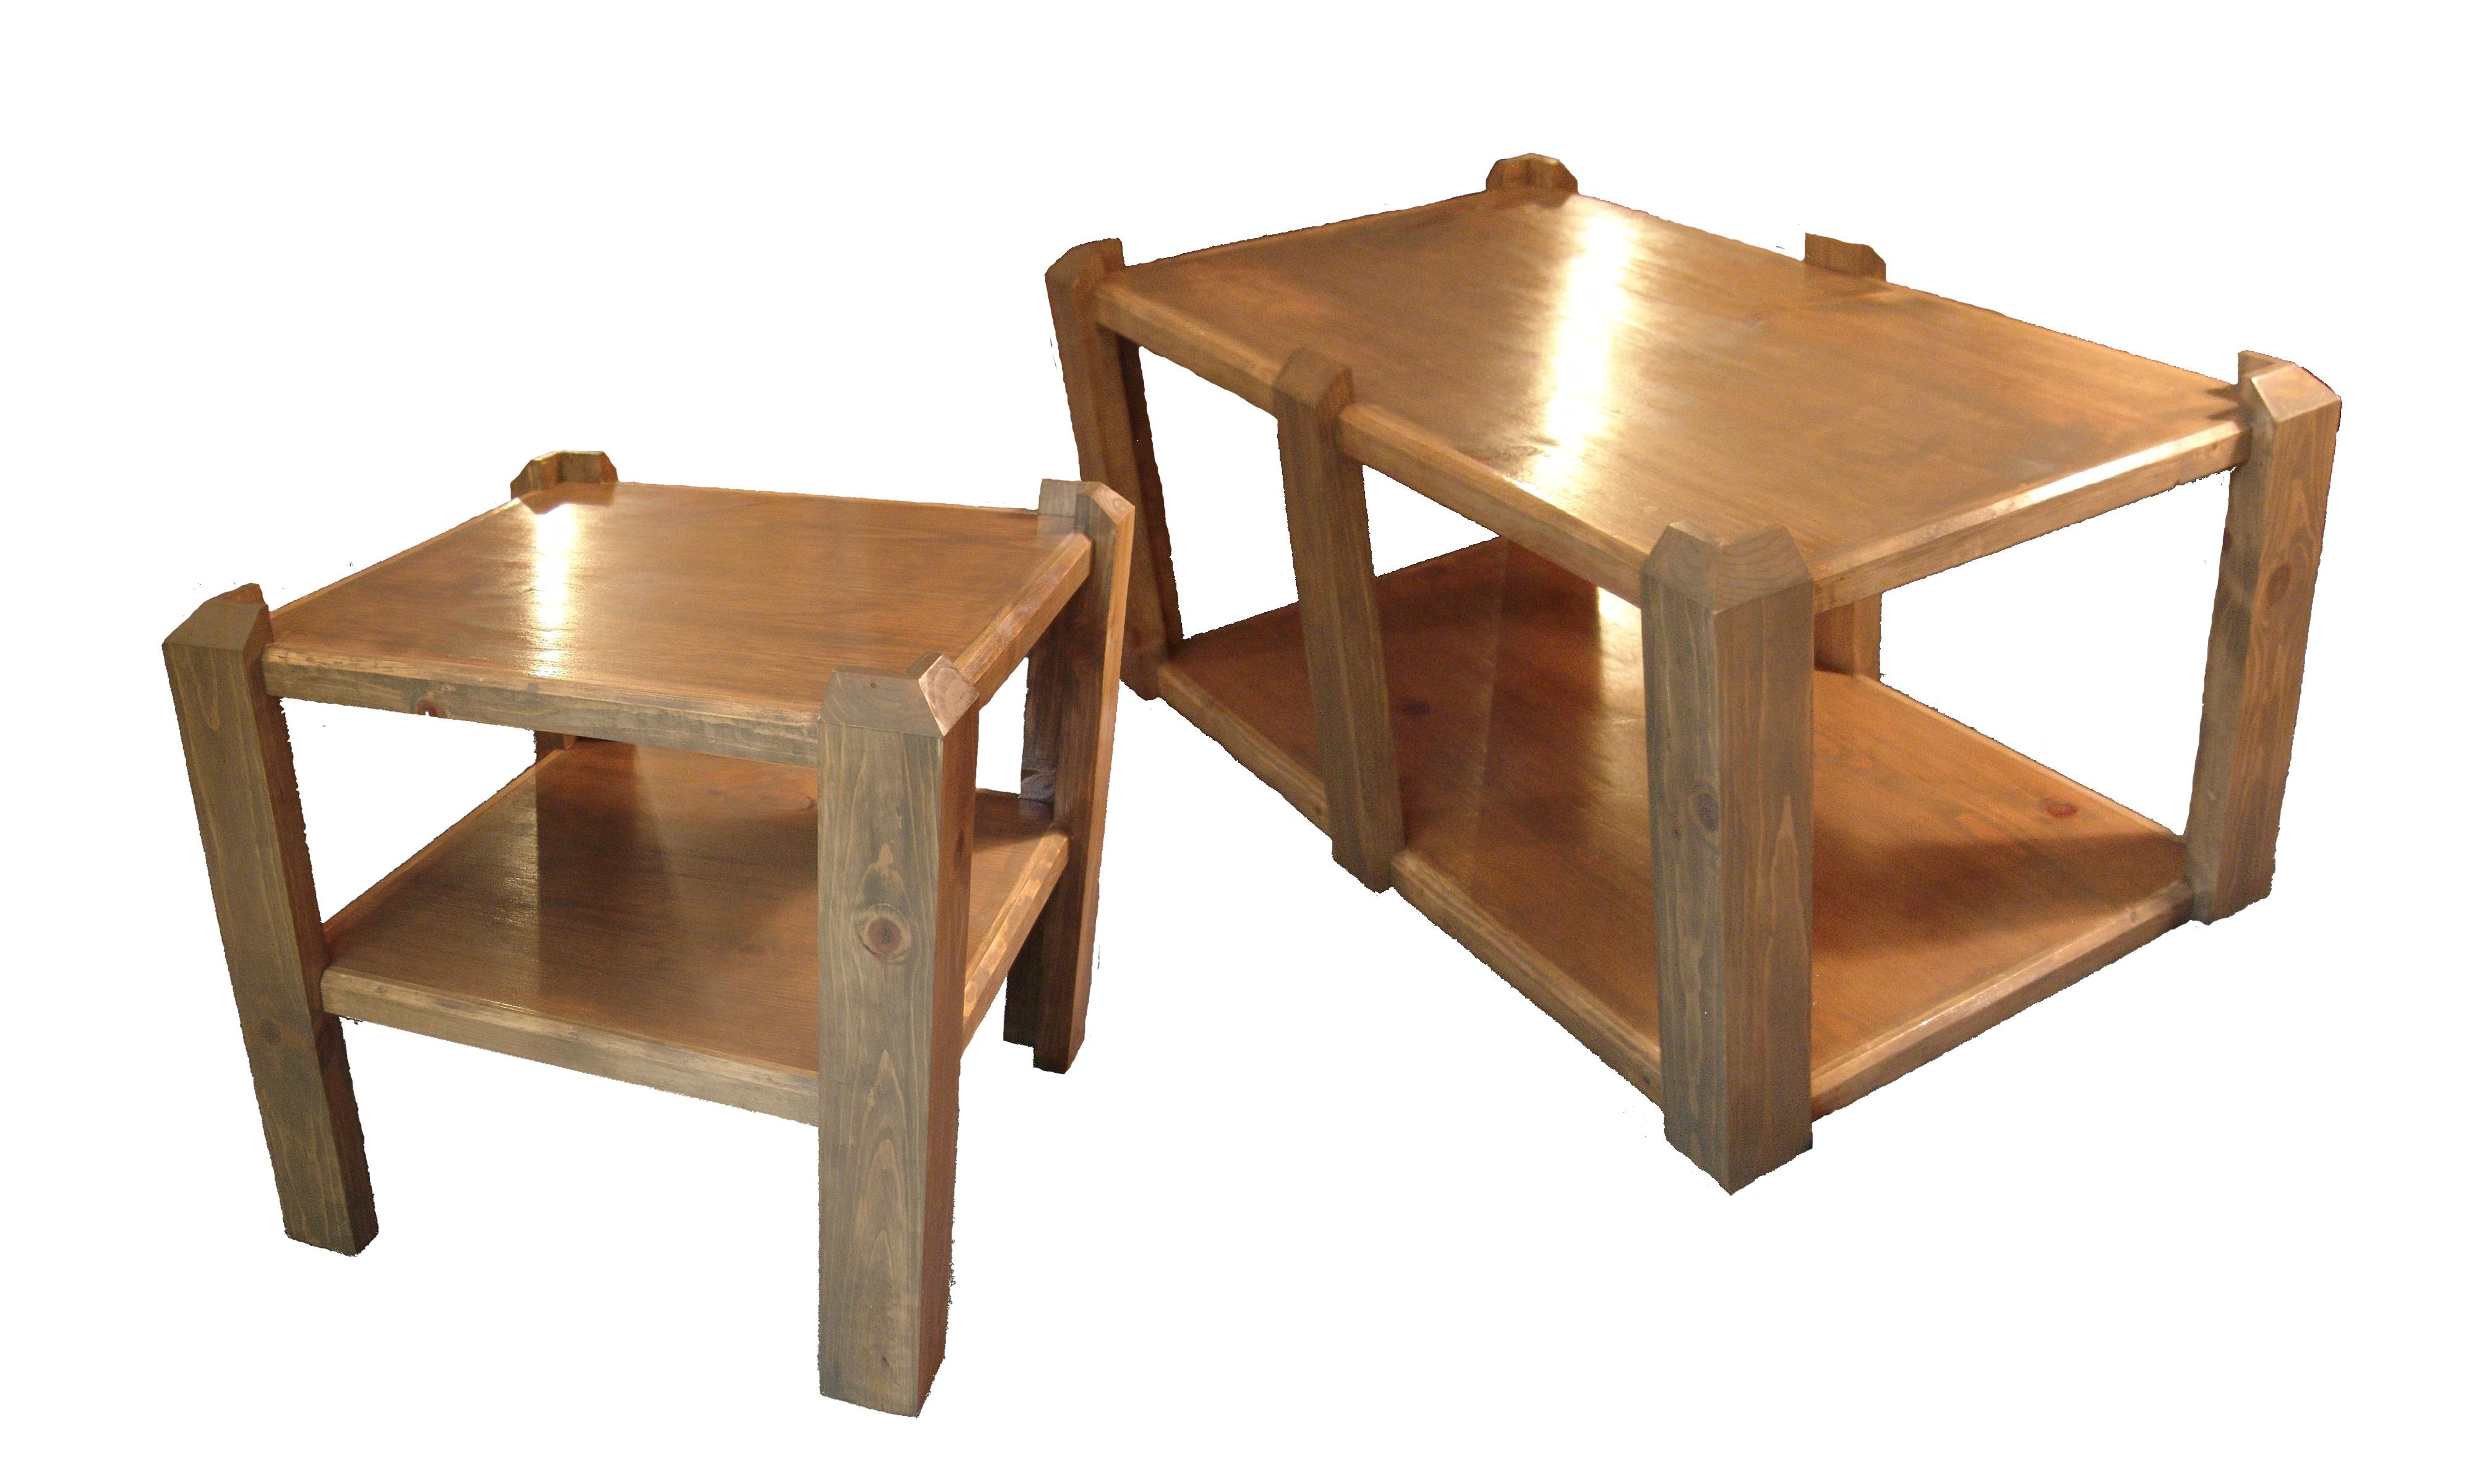 Free Images : wood, interior, shelf, furniture, decor